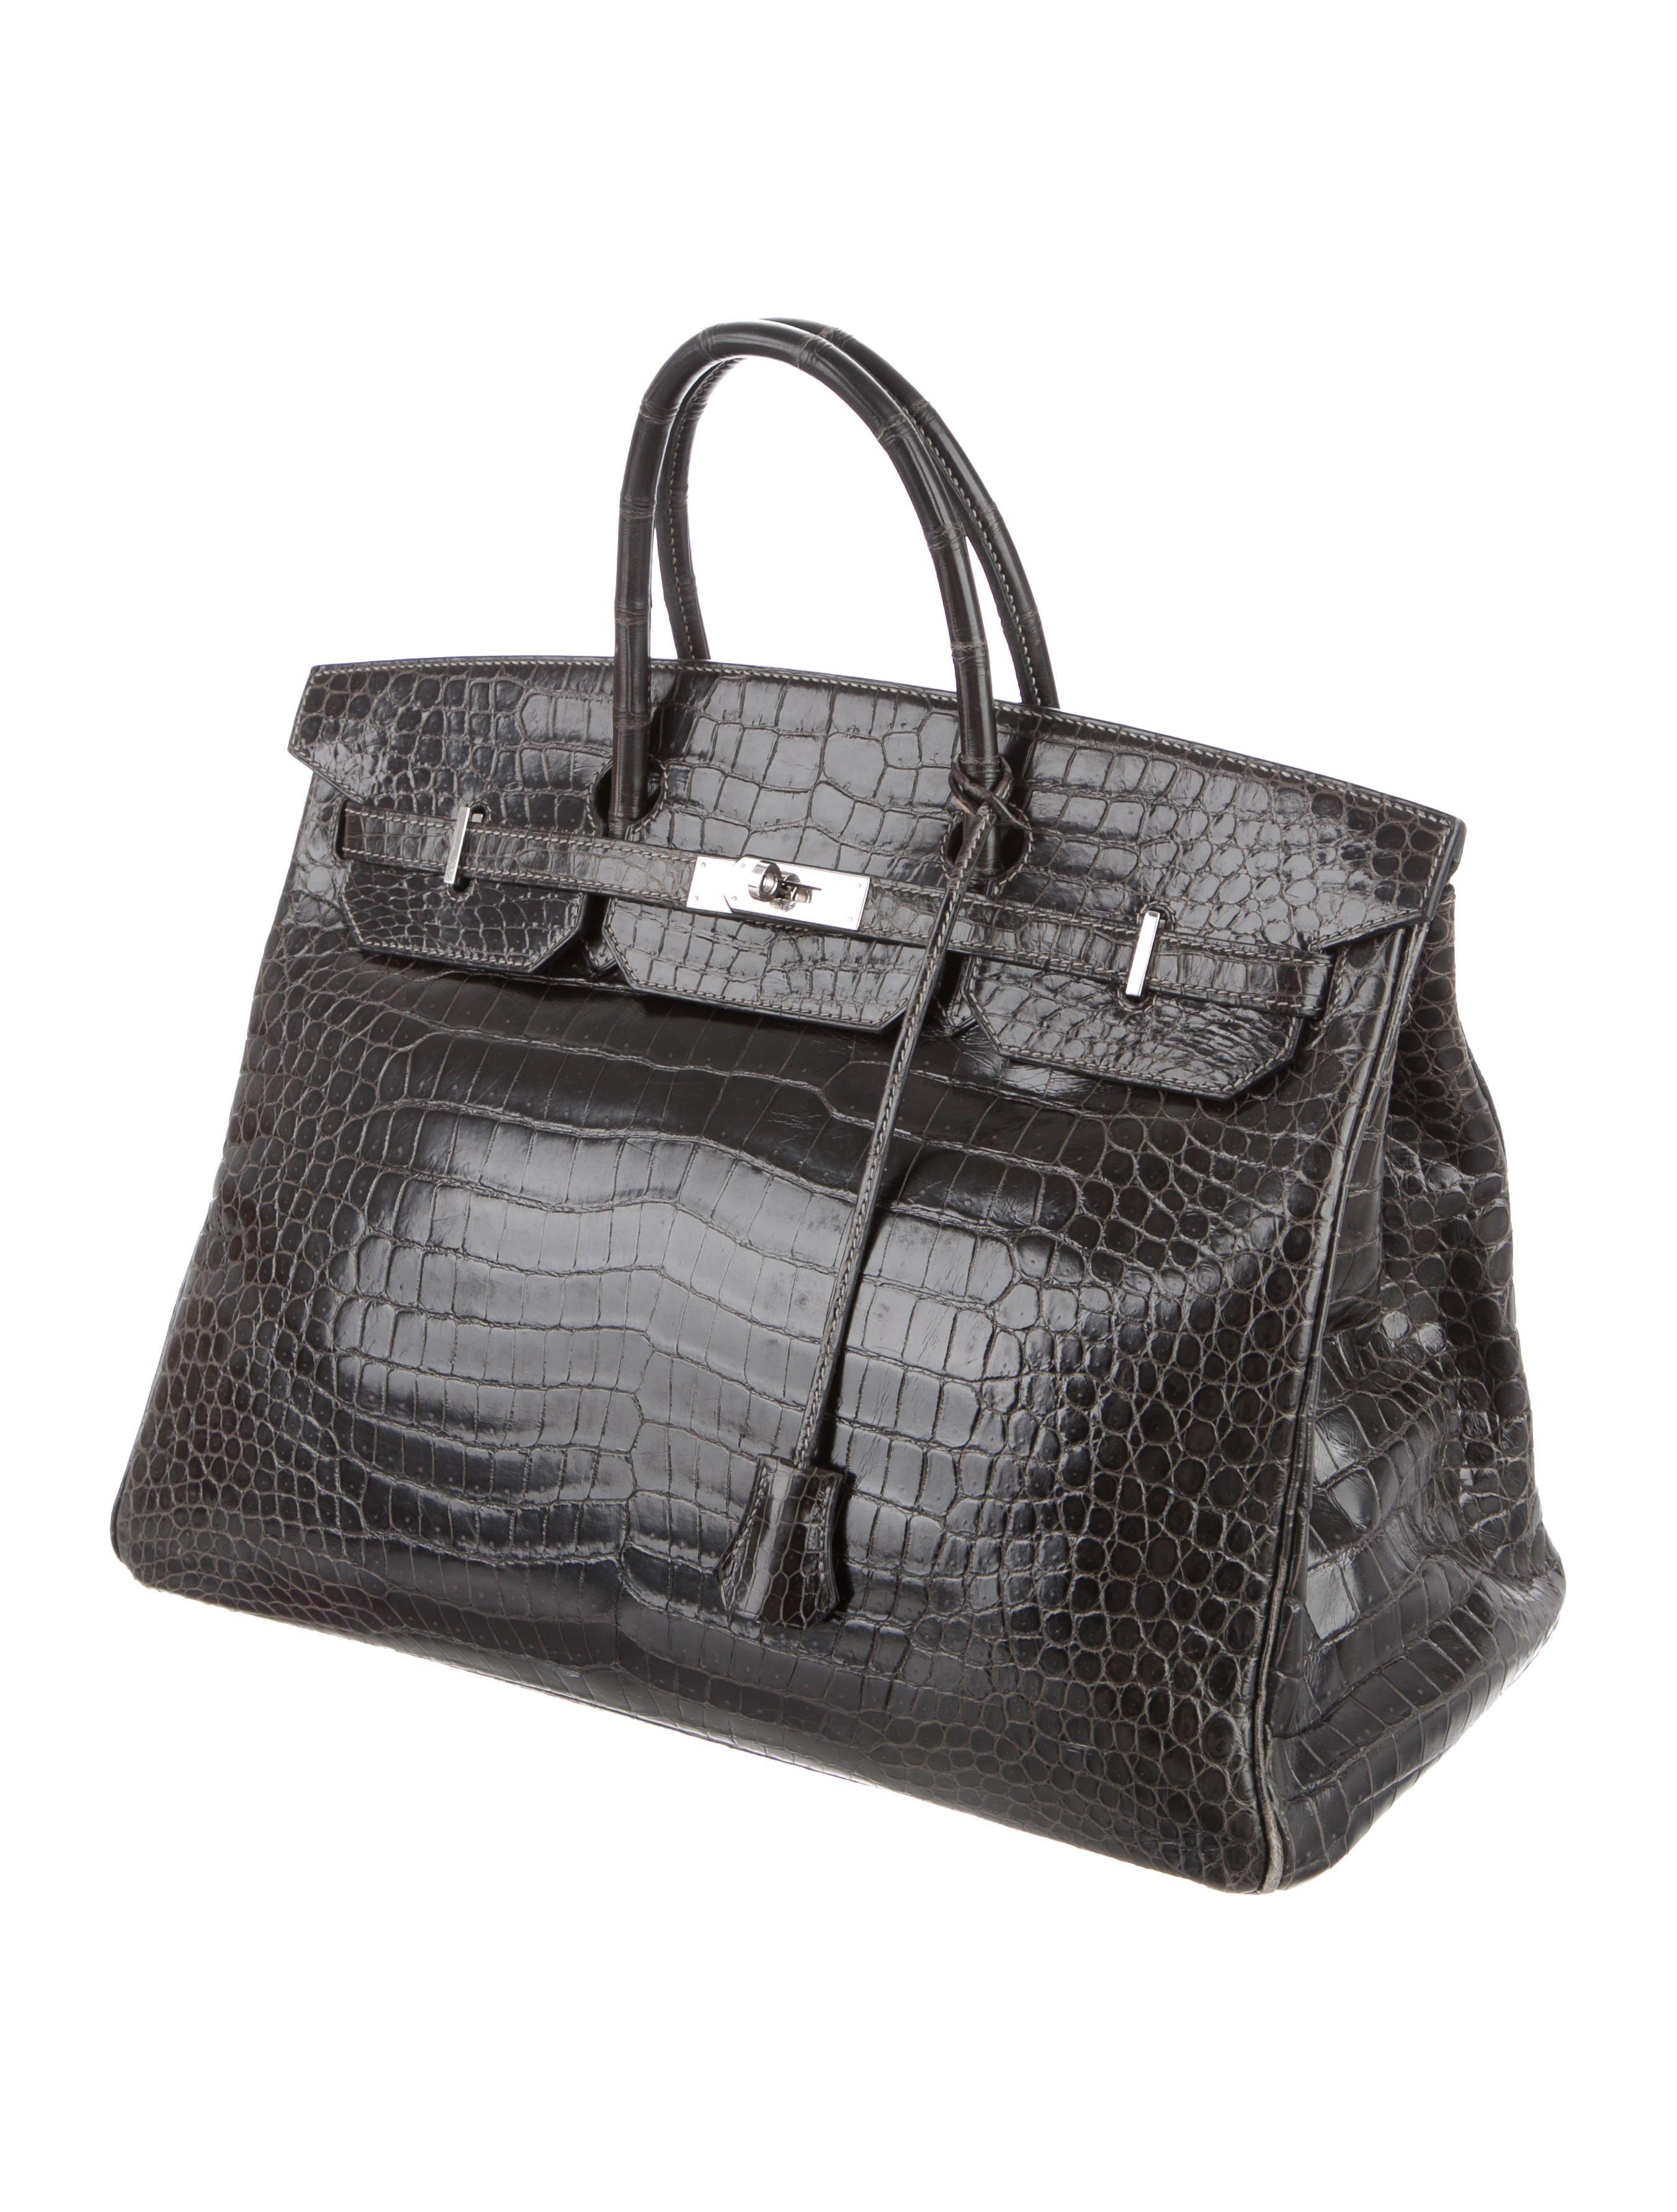 f3950bee6946 Men s Vert Bronze Porosus crocodile Hermès Birkin 40 with palladium hardware